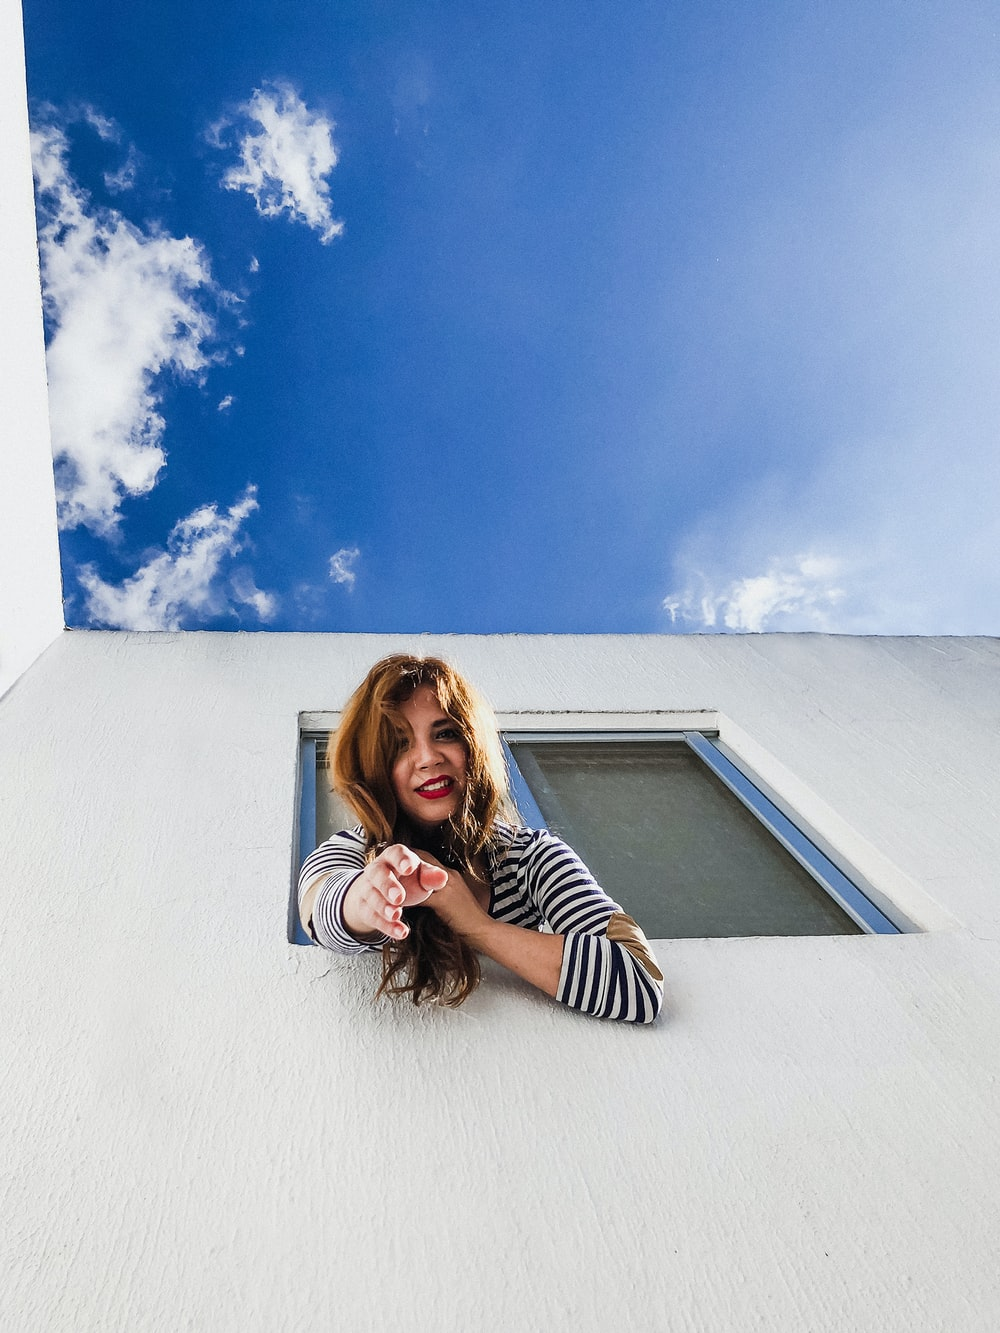 woman on window reaching her hands down under blue sky